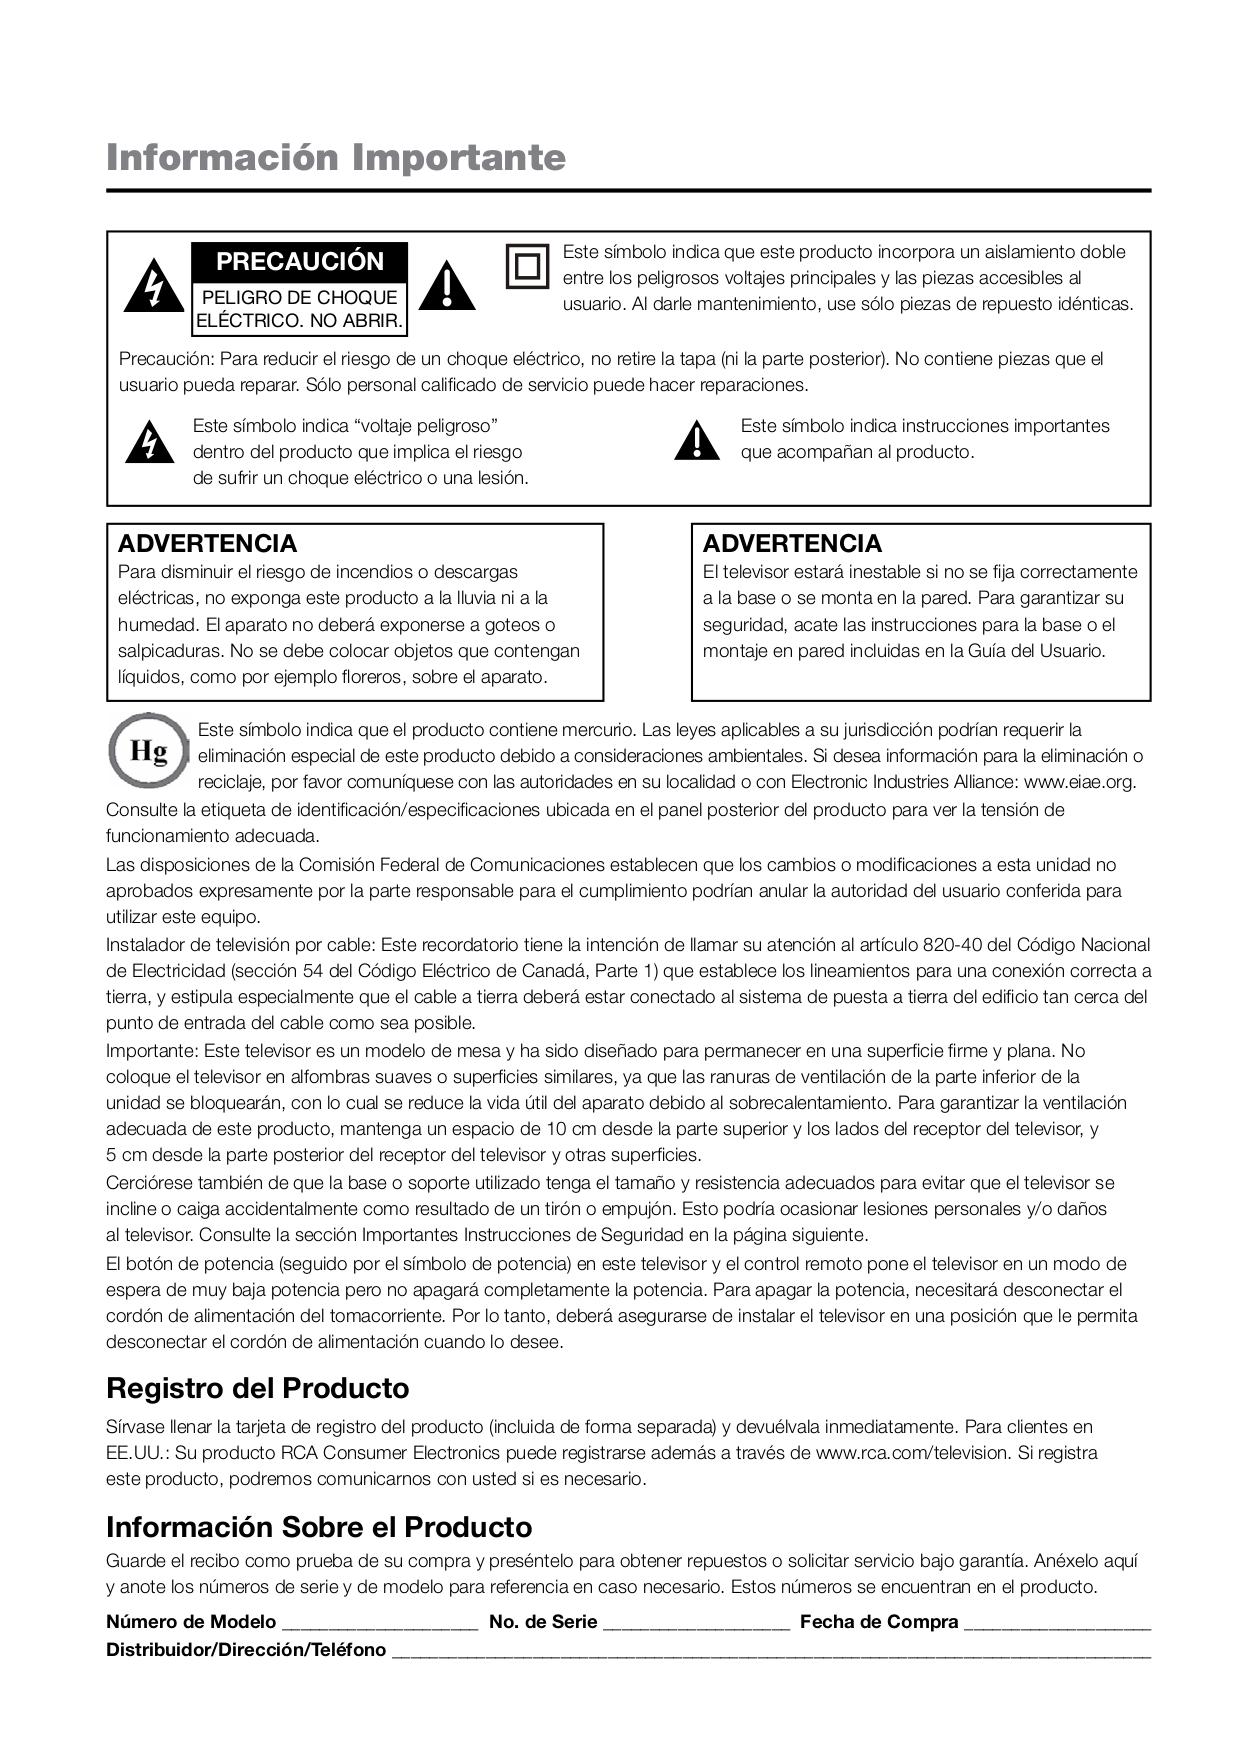 komatsu pc400 pc450 400lc 7 450lc 7 factory service repair manual download